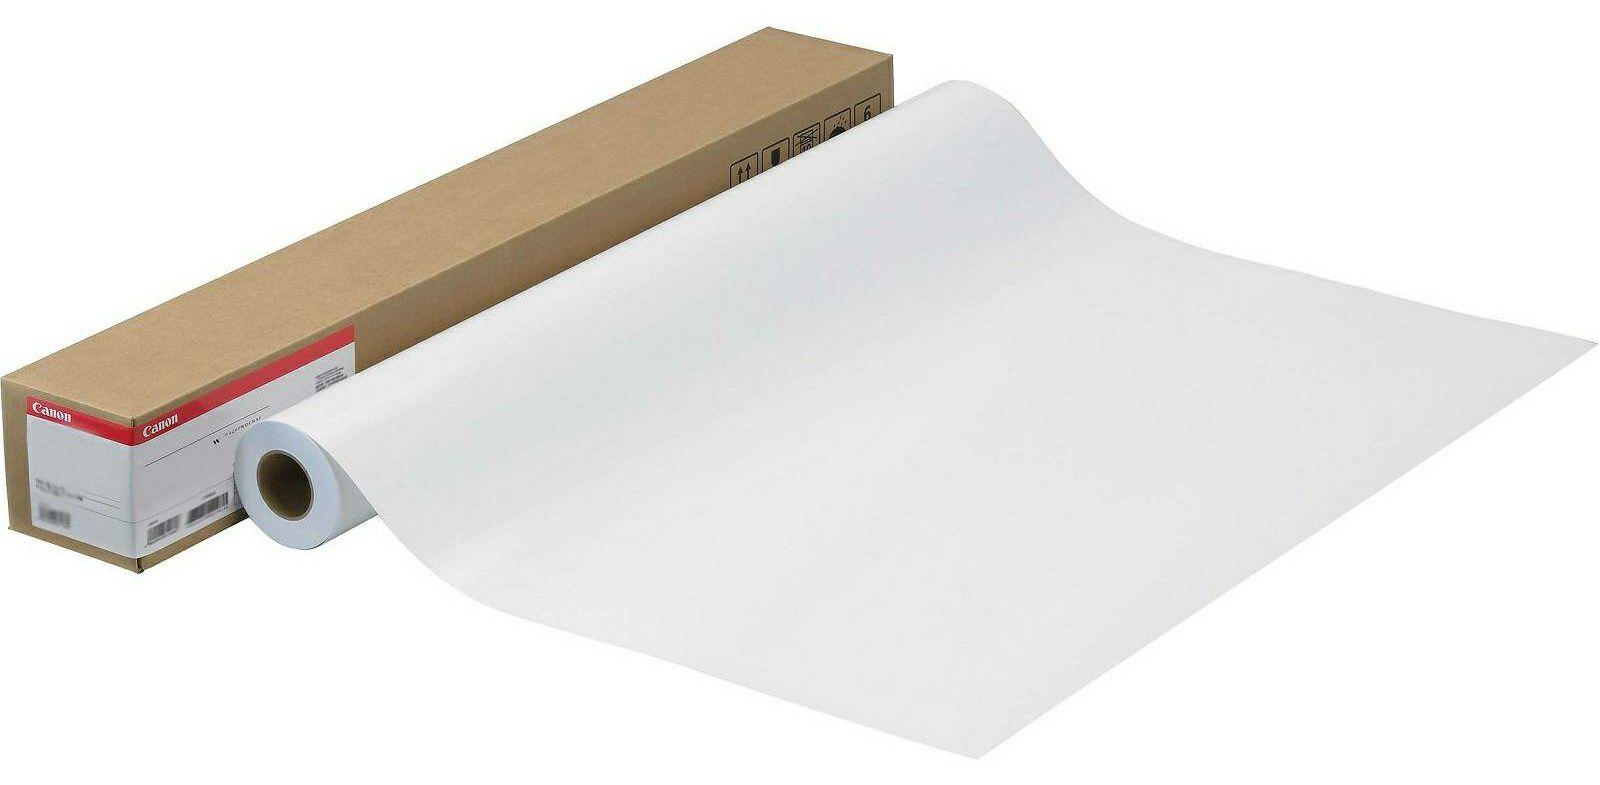 Canon Matt Coated Paper 140gsm 36